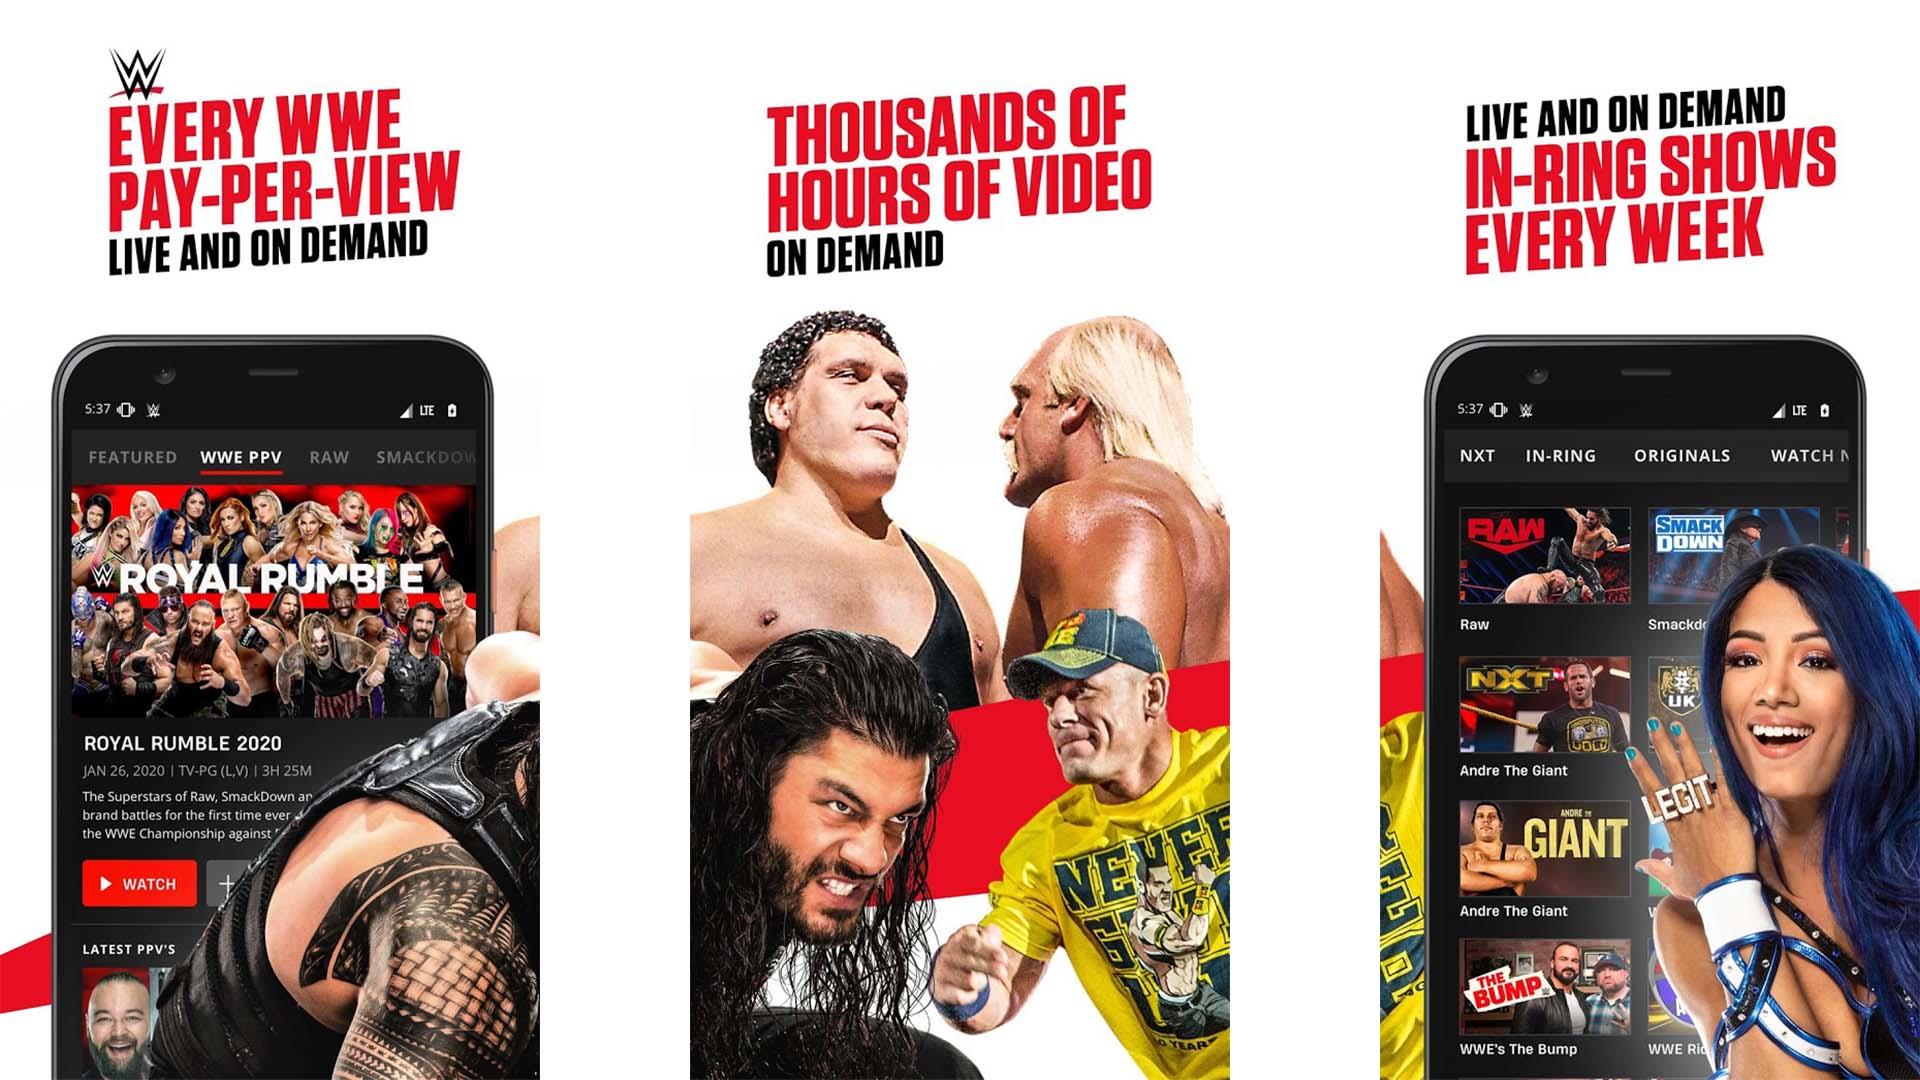 WWE screenshot 2021